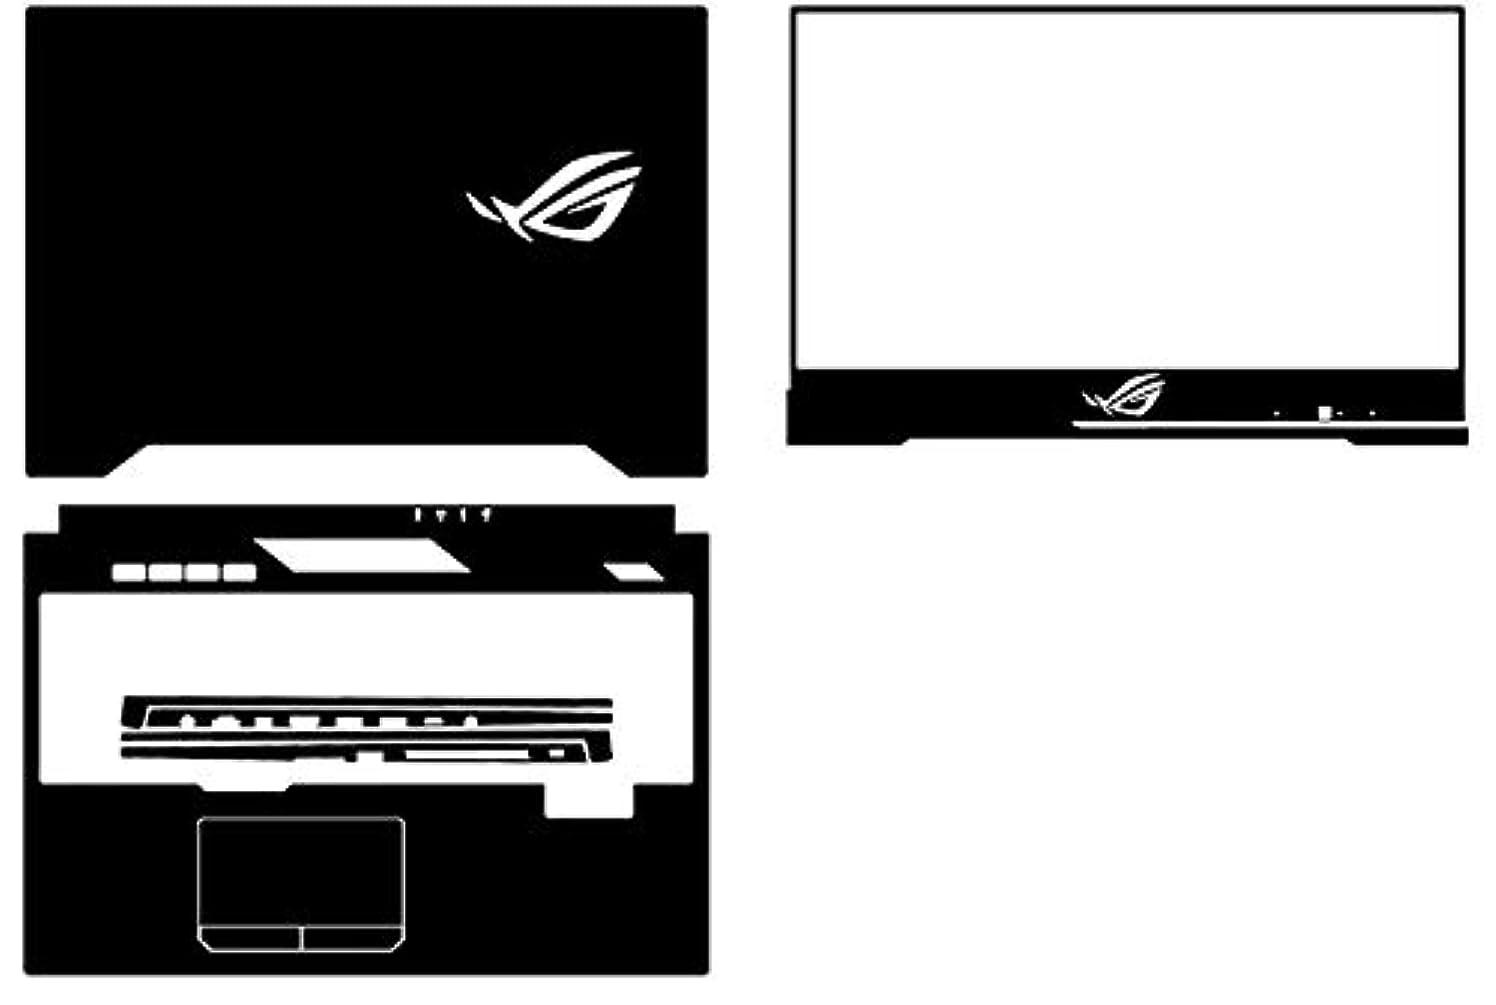 Special Laptop Black carbon fiber Vinyl Skin Stickers Cover for Asus ROG Strix Hero II GL504GV GL504GW GL504 GL504GM GL504GS 15.6